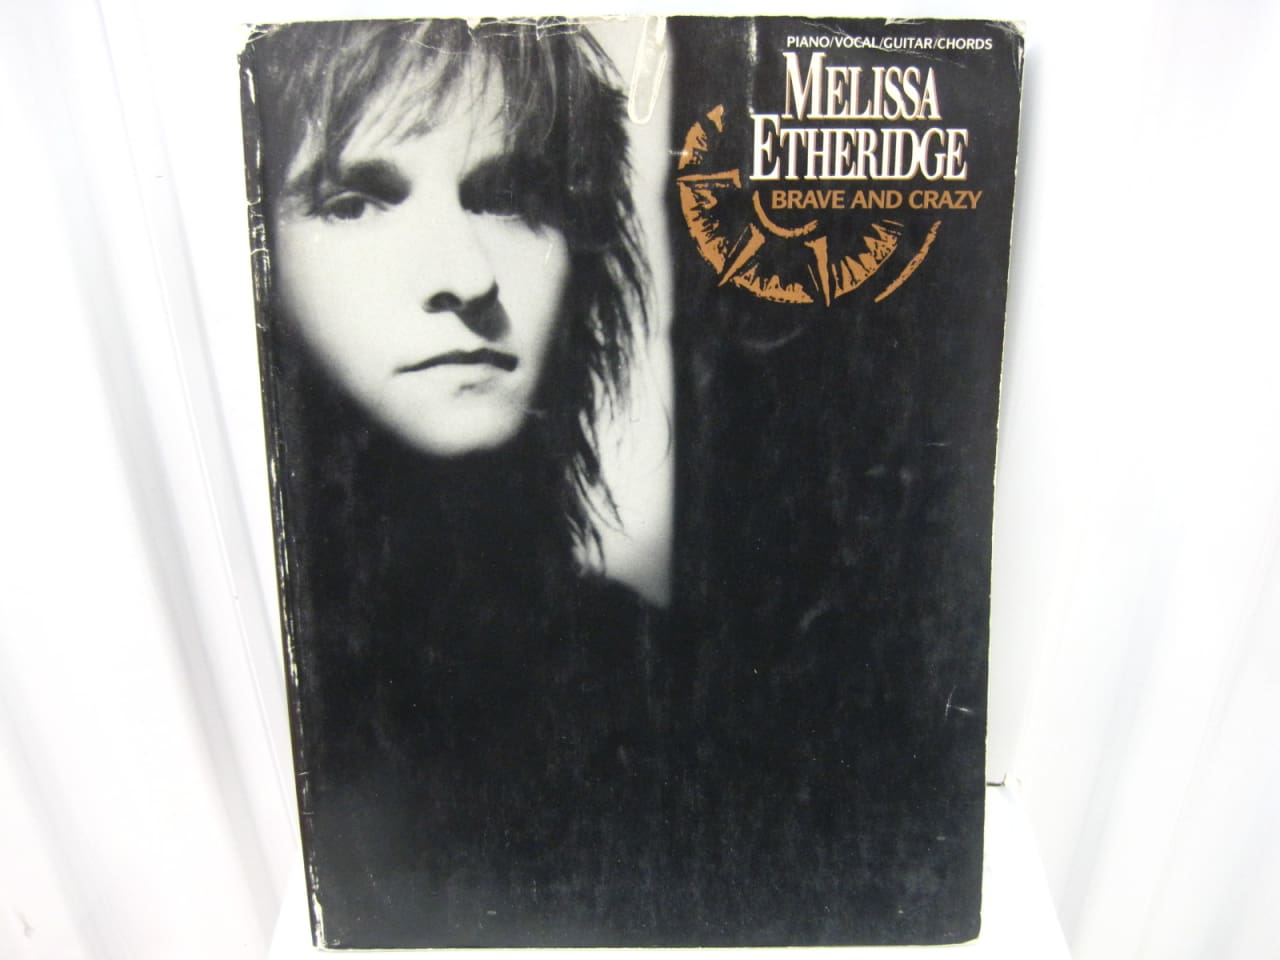 Melissa Etheridge Brave And Crazy Piano Vocal Guitar Chords Reverb